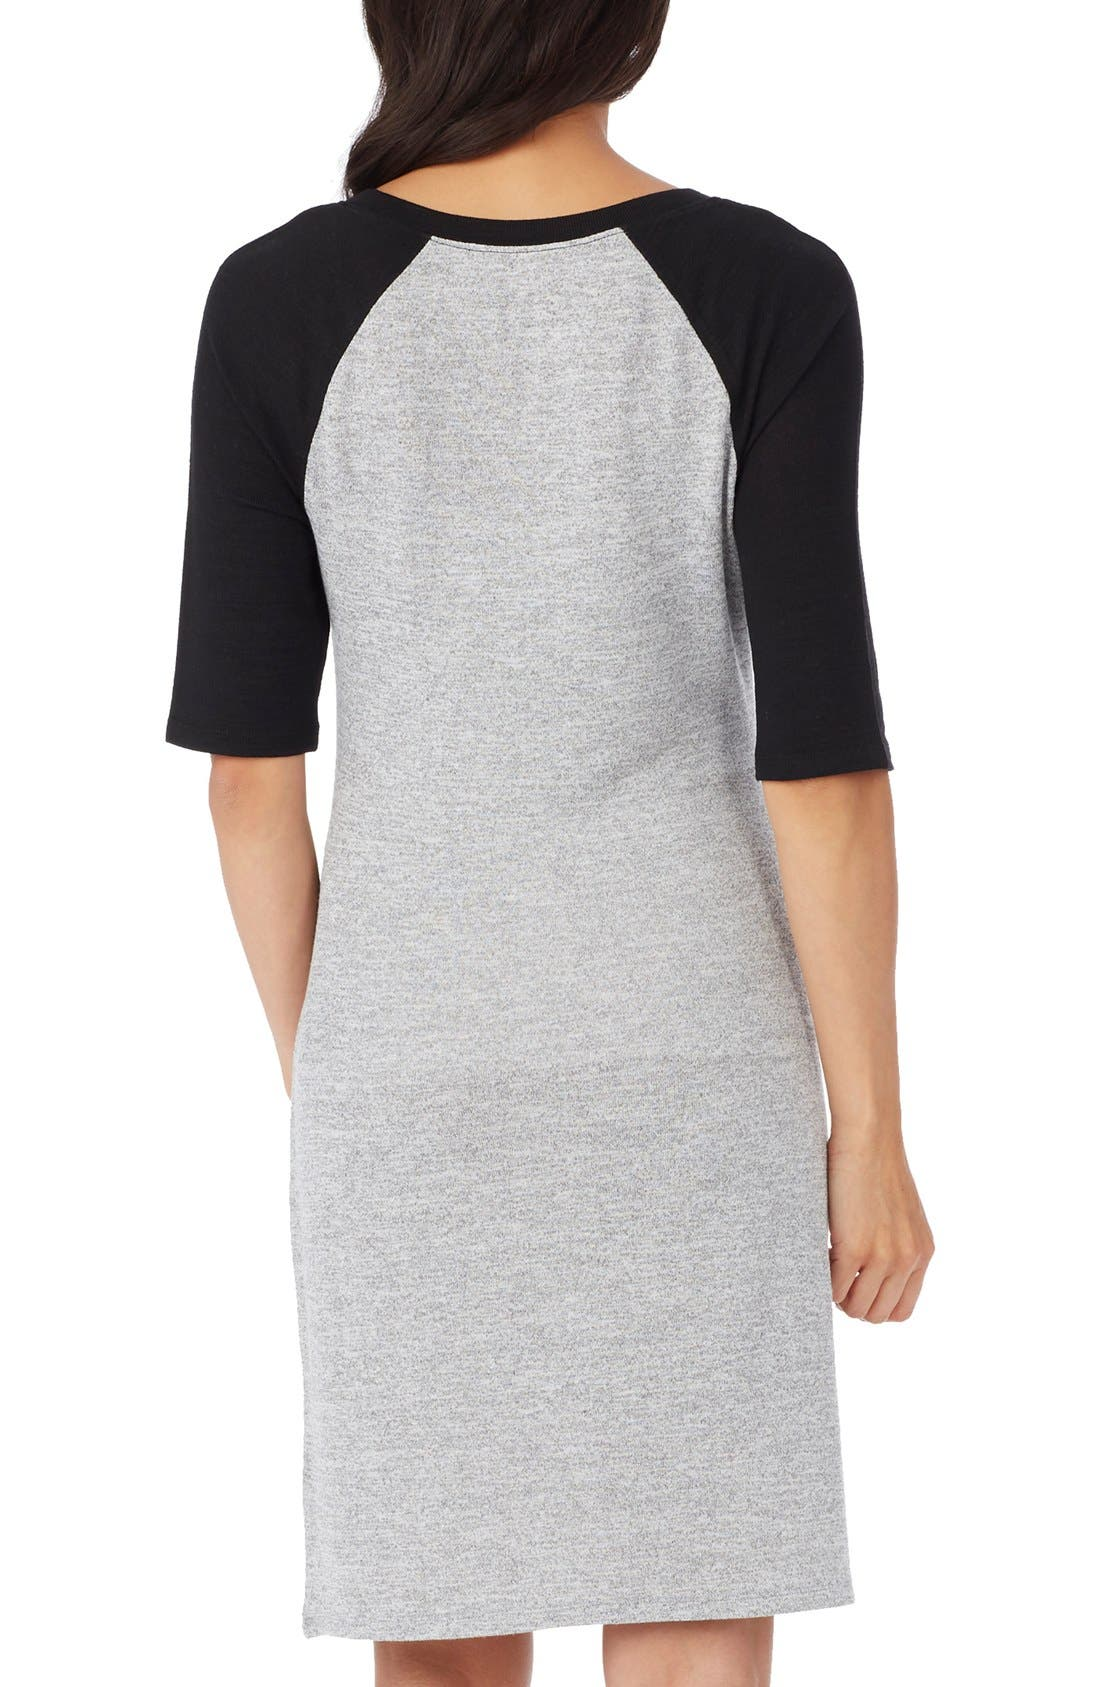 'Derek' Raglan Sleeve Maternity Dress,                             Alternate thumbnail 2, color,                             Heather Grey/ Black Combo